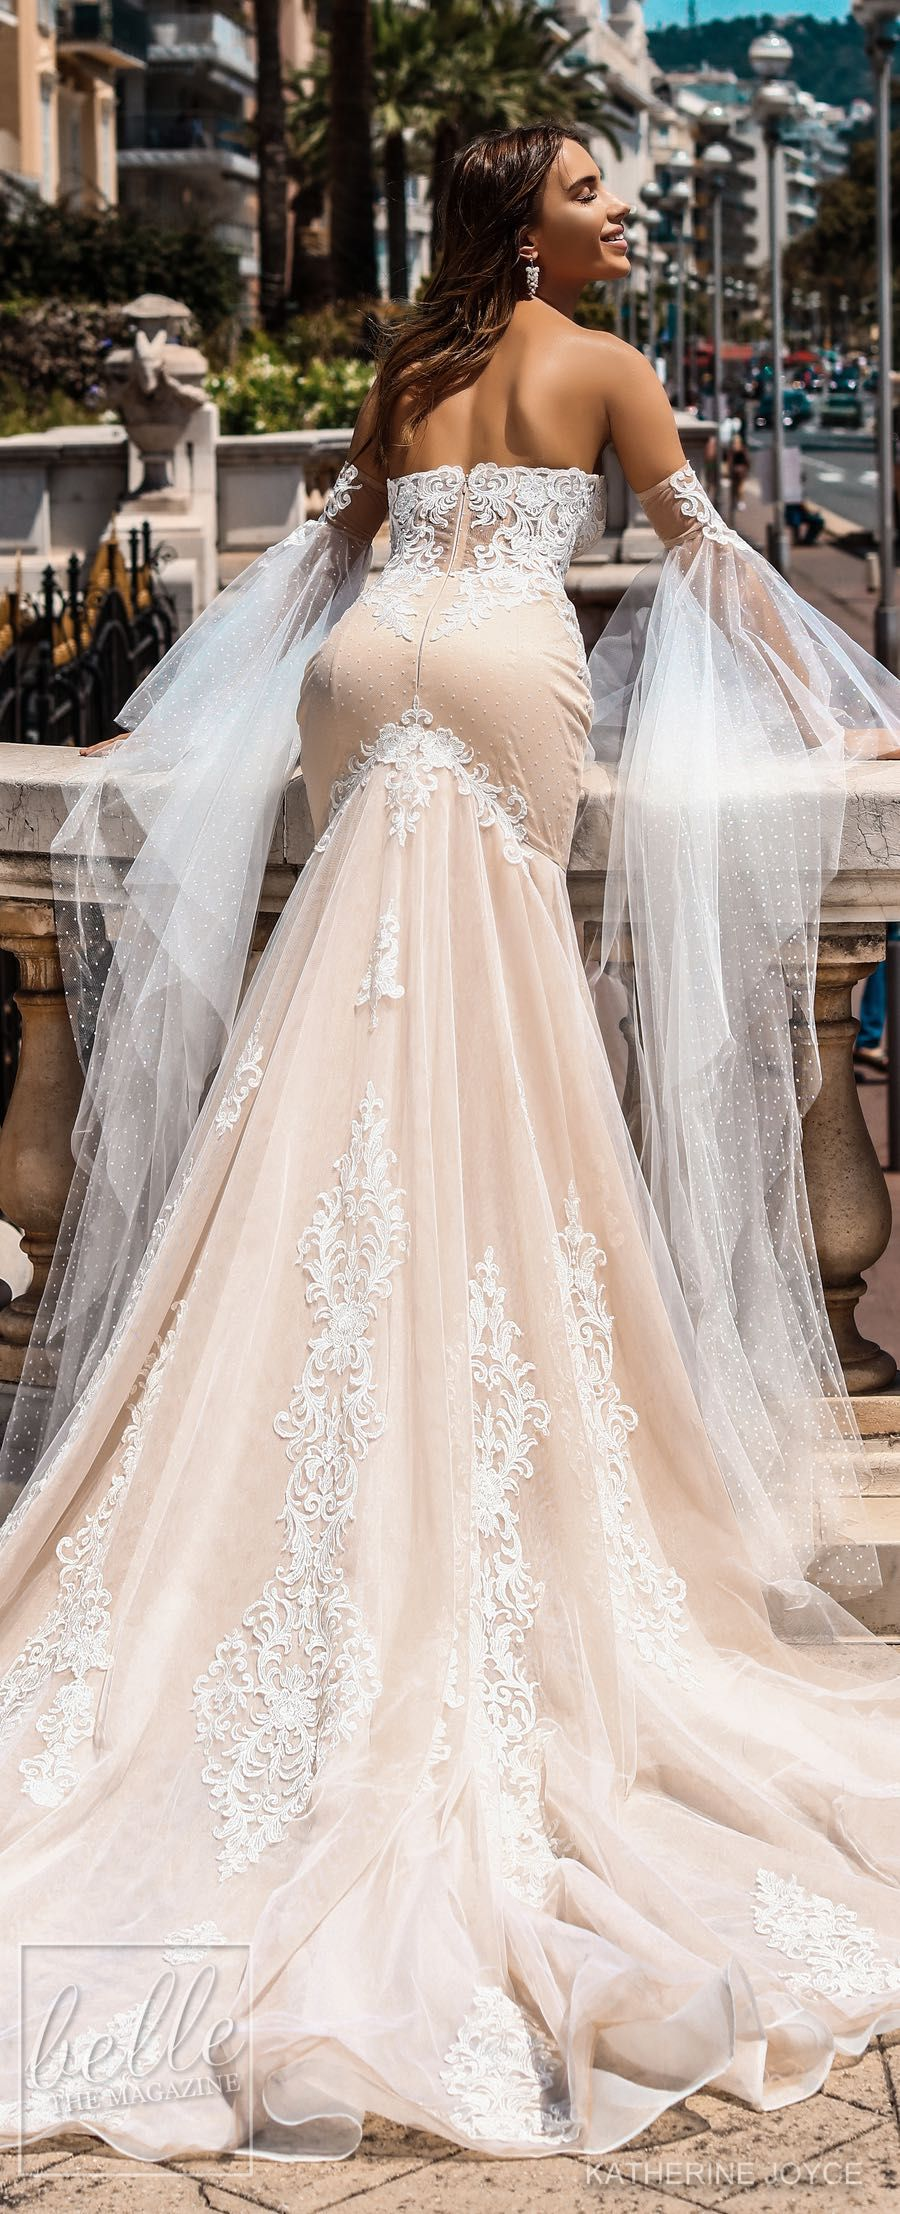 Wedding Dresses by Katherine Joyce Bridal: Ma Cheri Collection ...